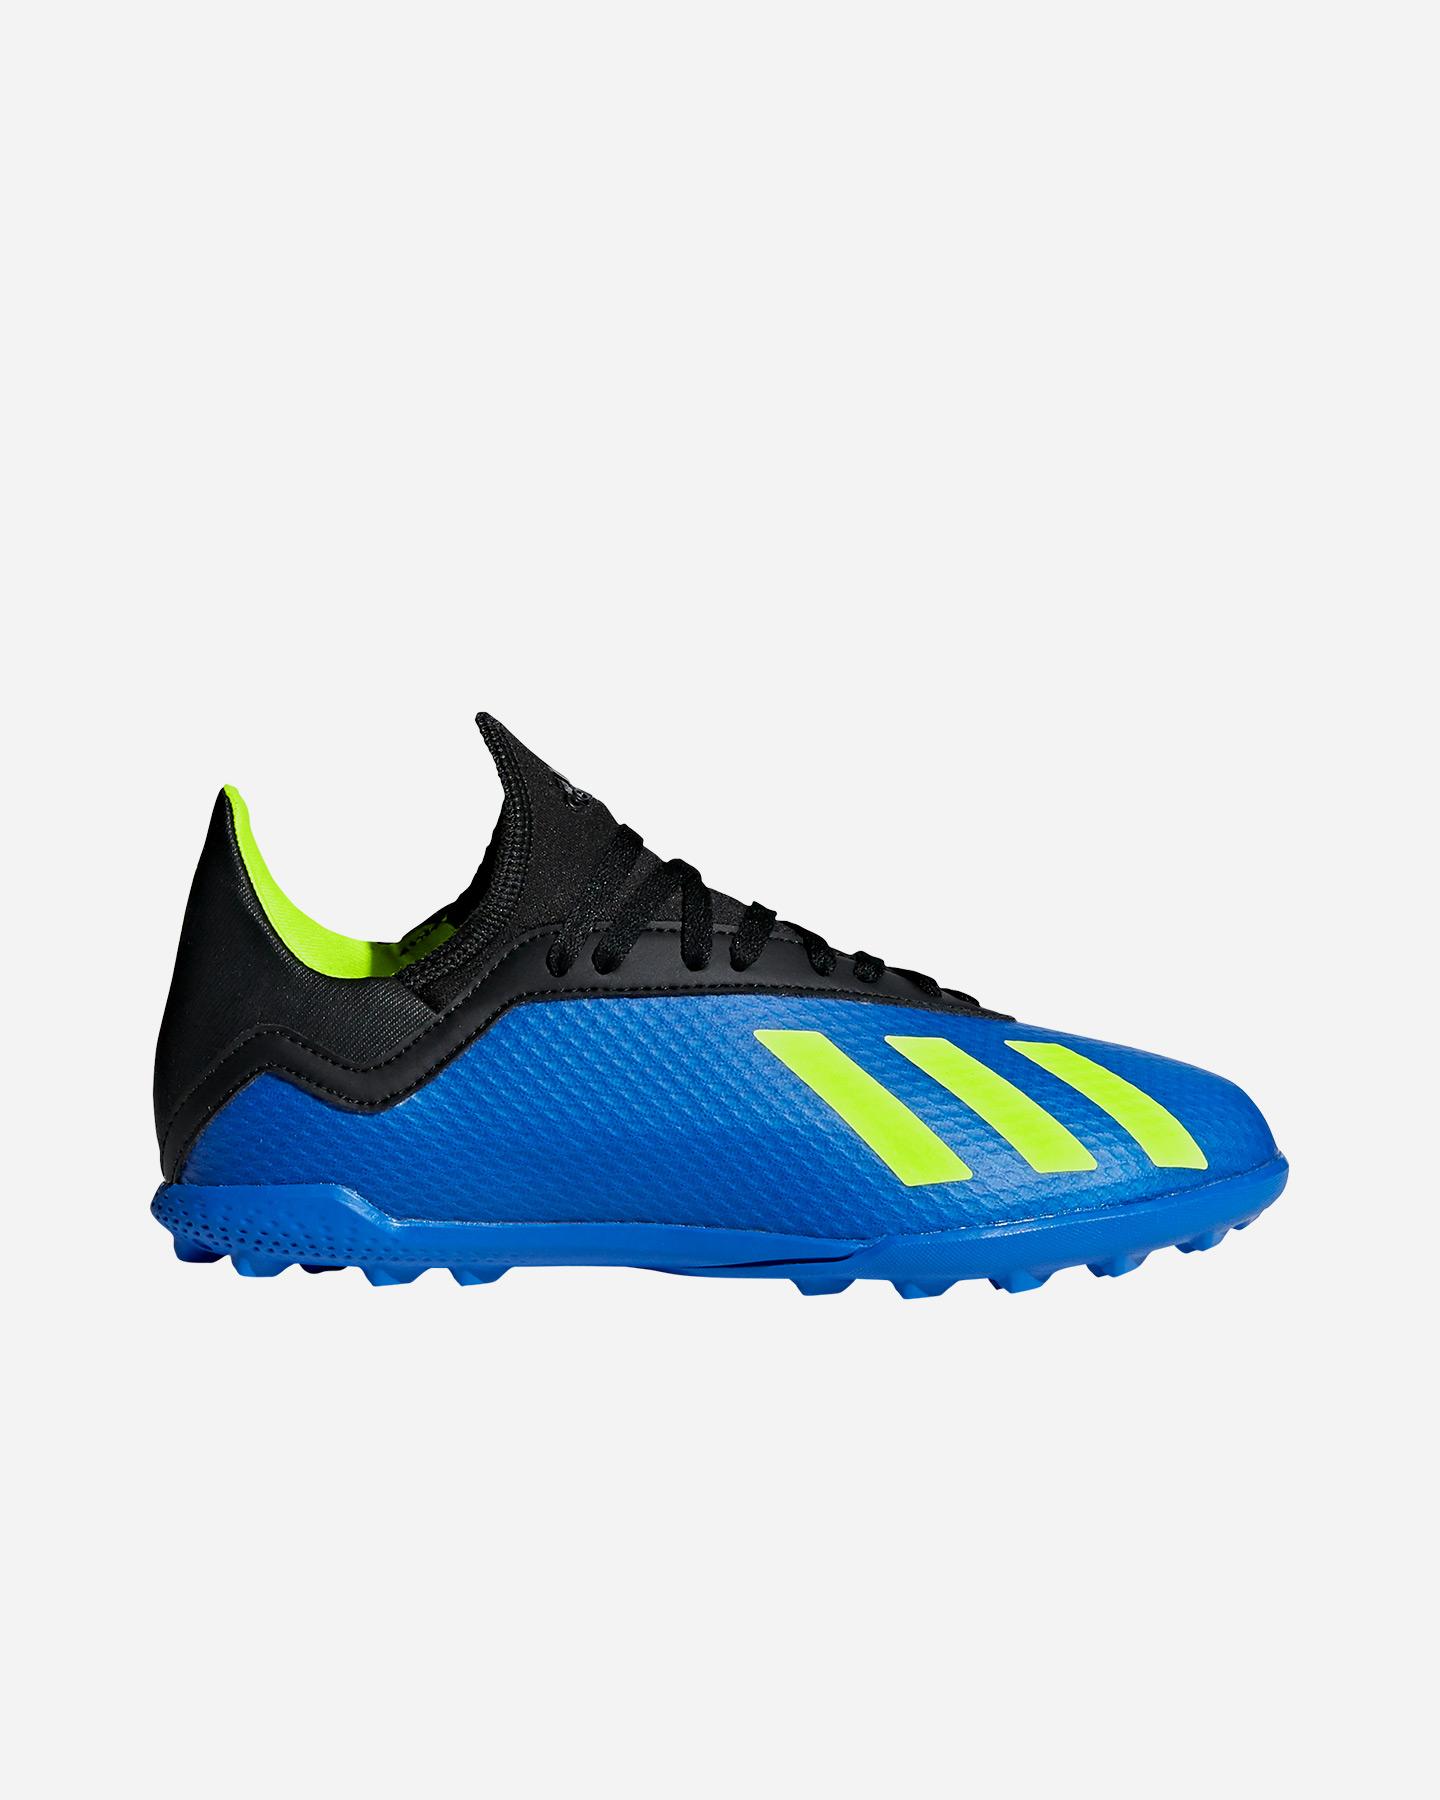 best website 8ca2c 43d69 Scarpe calcio ADIDAS X TANGO 18.3 TF JR ...